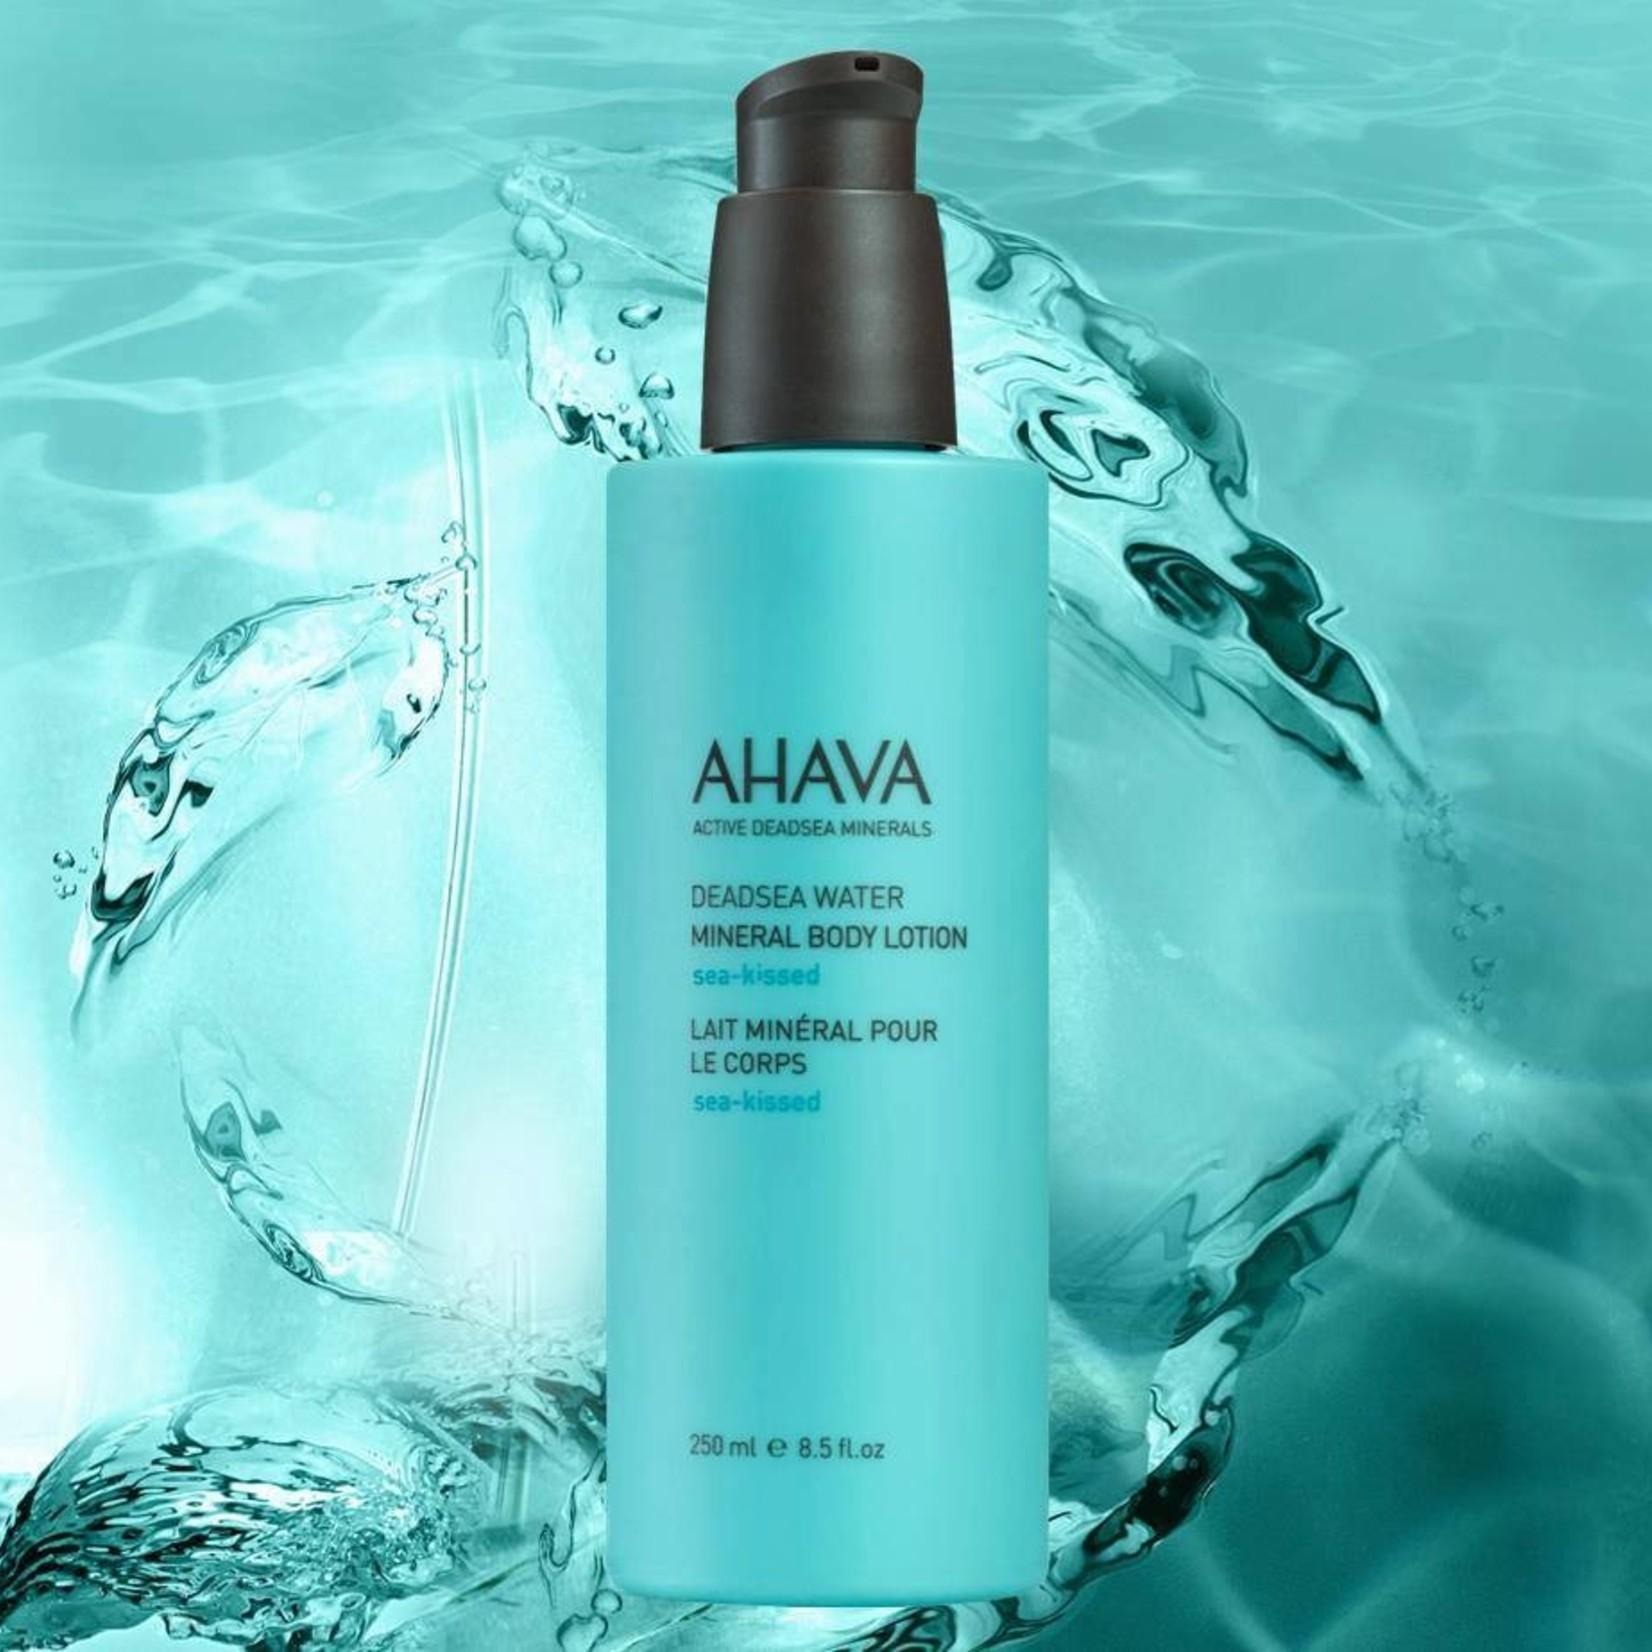 AHAVA Mineral body lotion sea kissed 250ml